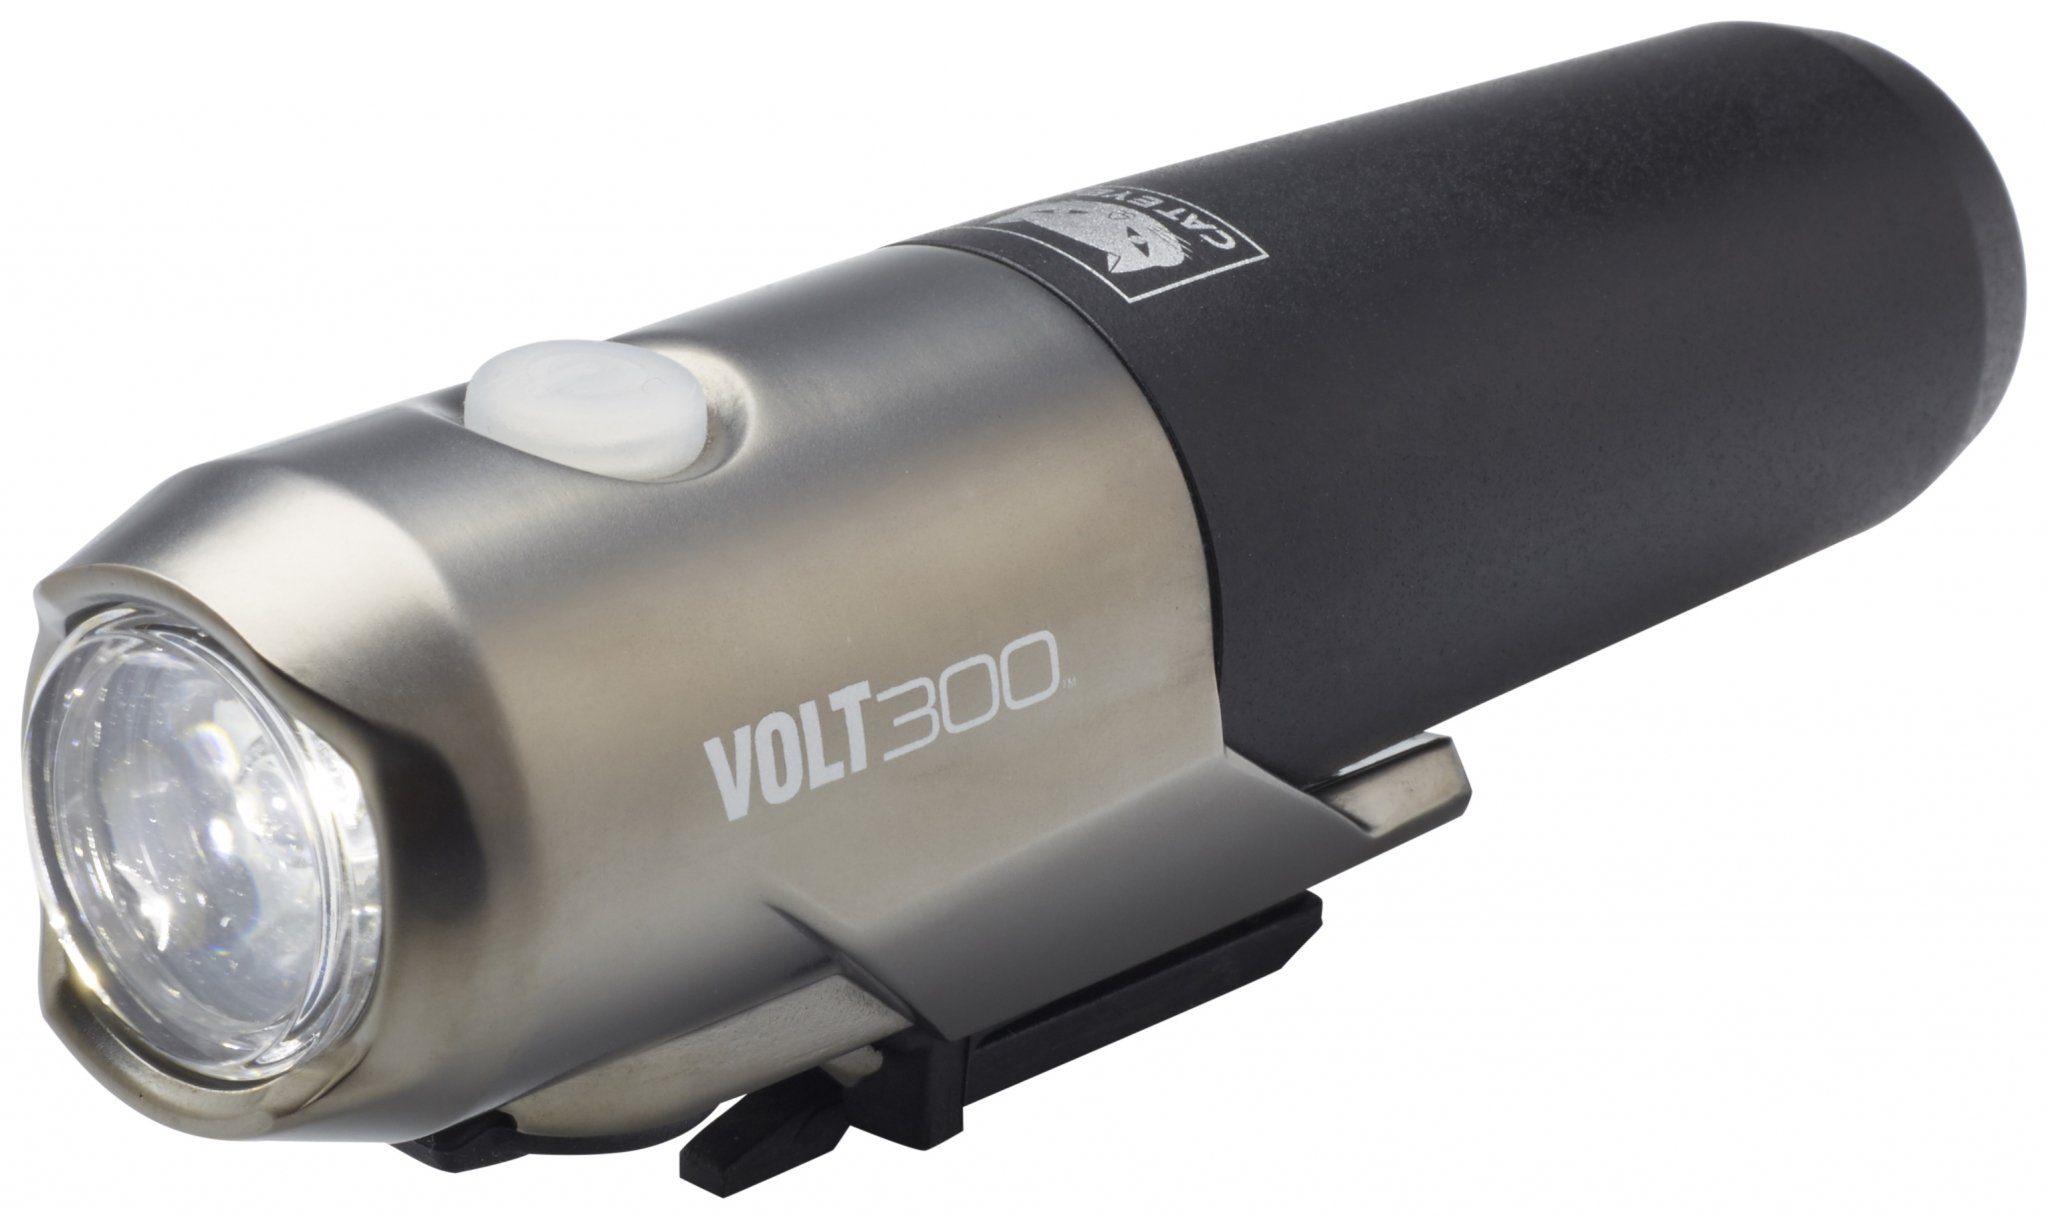 Cateye Fahrradbeleuchtung »Volt300 HL-EL460 RC Helmlampe Set«